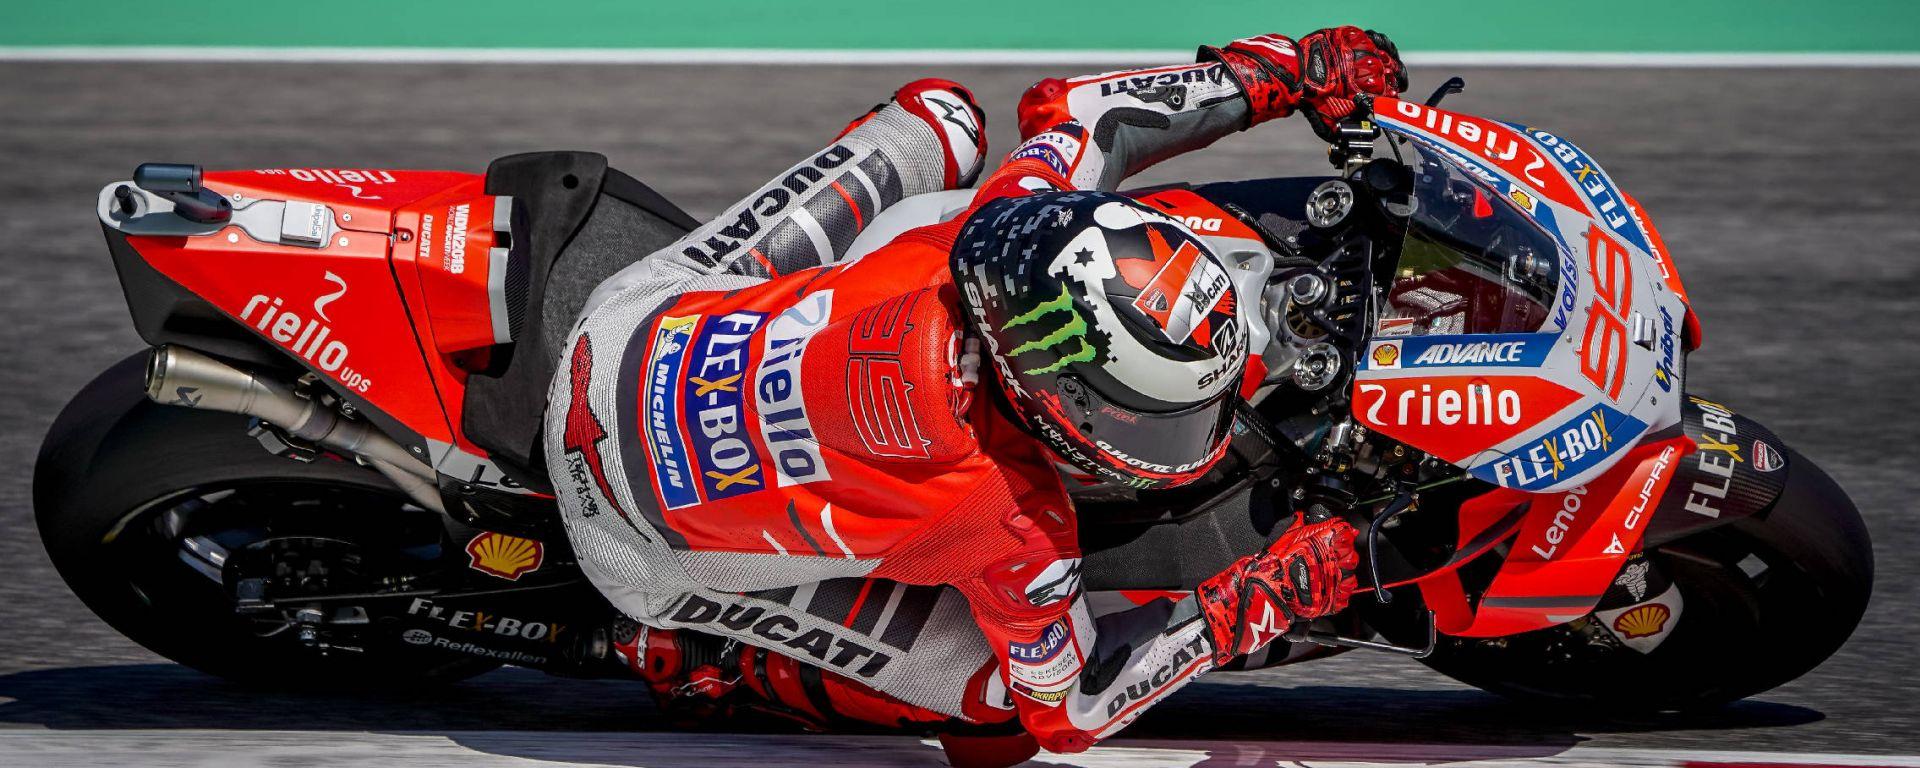 MotoGP Mugello 2018: vittoria schiacchiante di Jorge Lorenzo